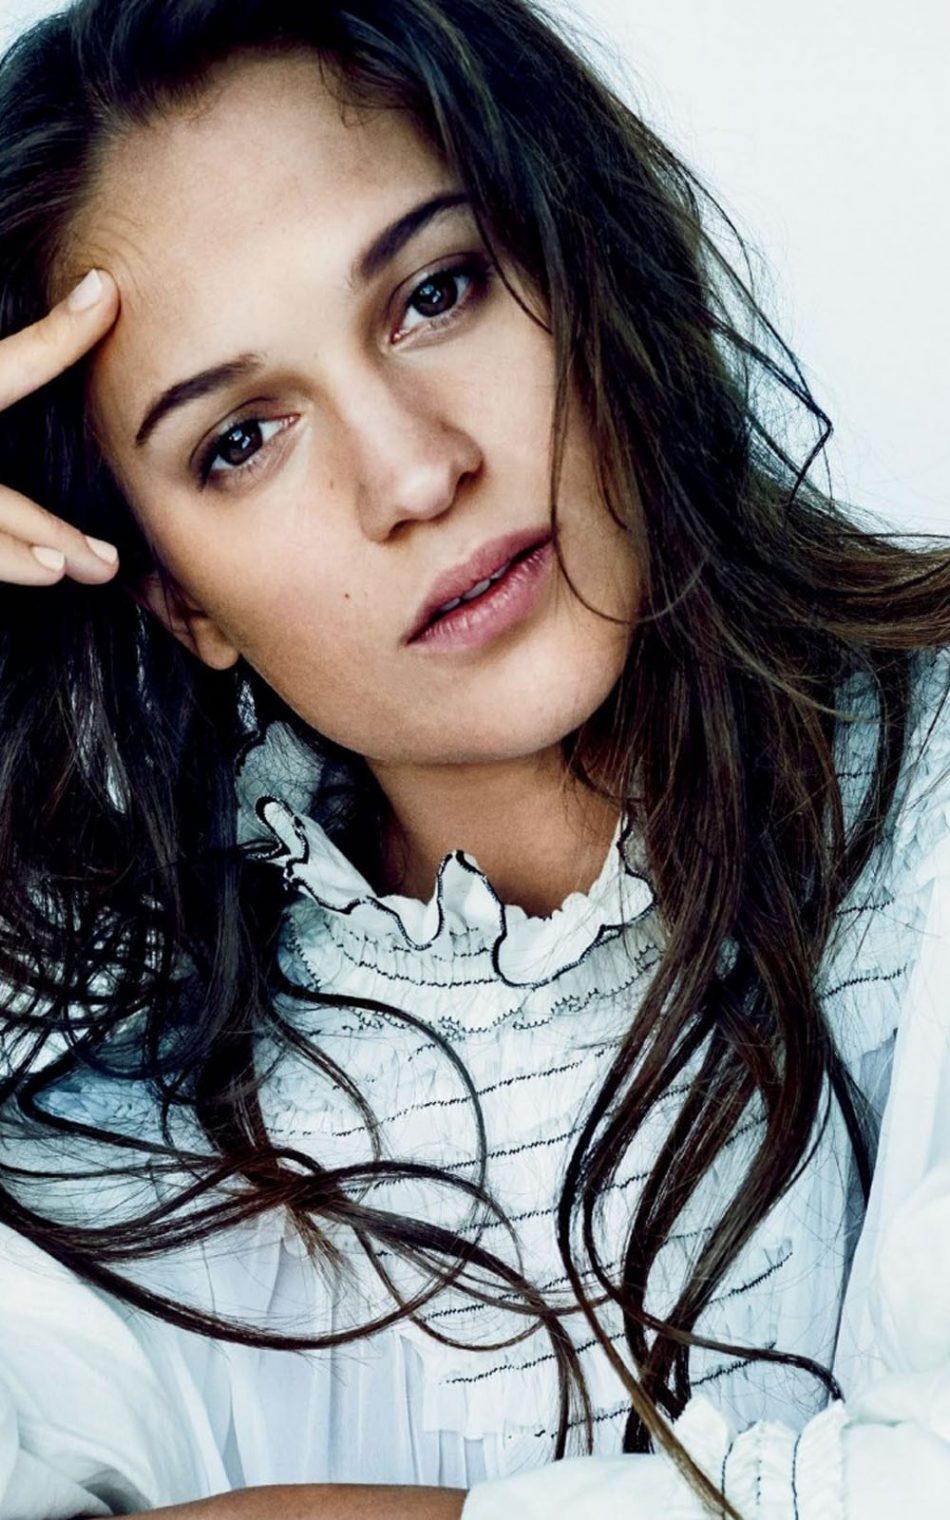 Alicia Vikander Swedish Actress HD Mobile Wallpaper